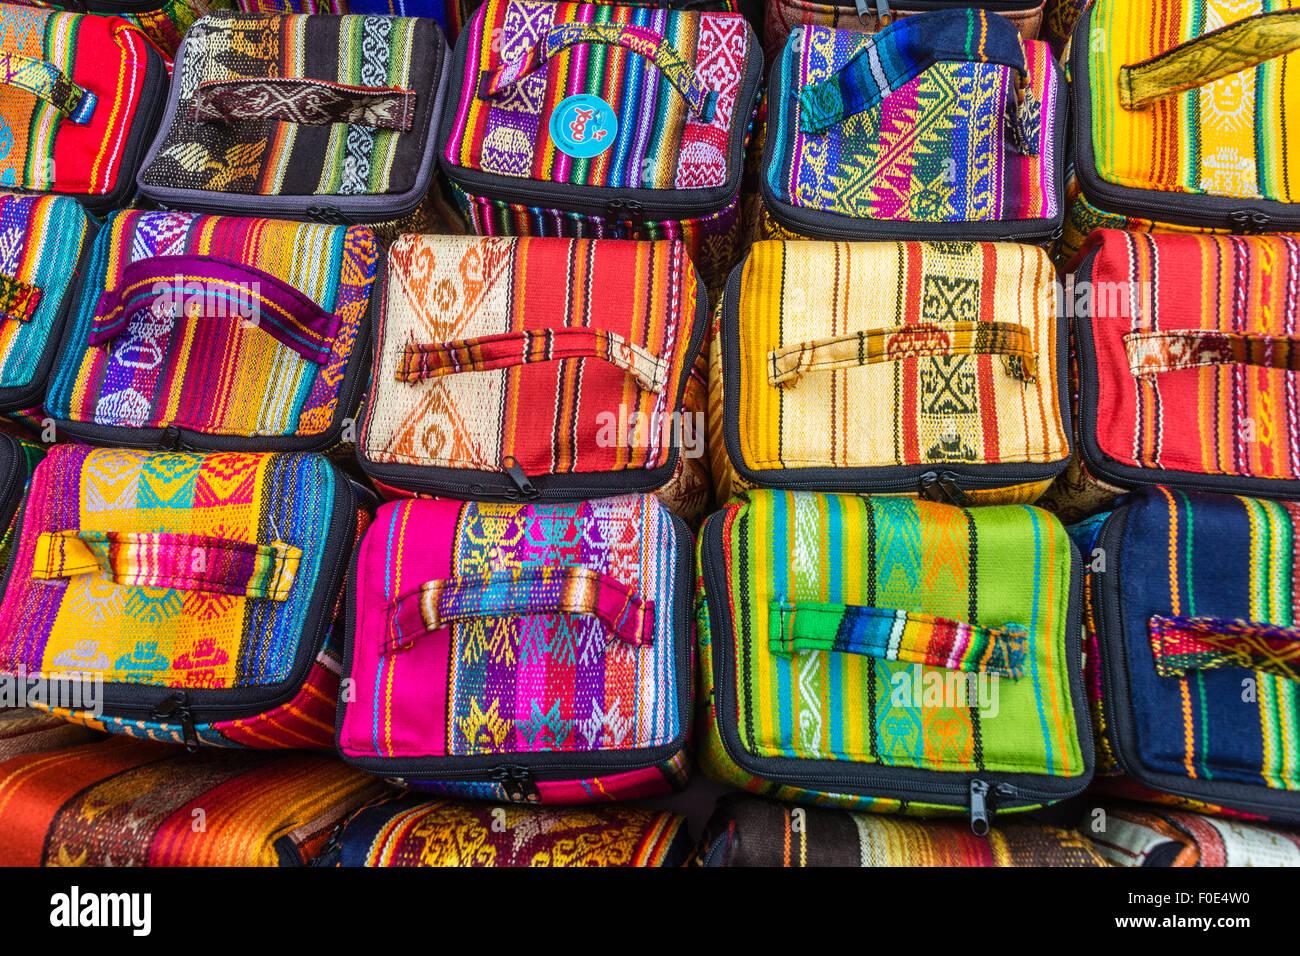 Colorful bags displayed at souvenier shop in Otavalo, Ecuador - Stock Image